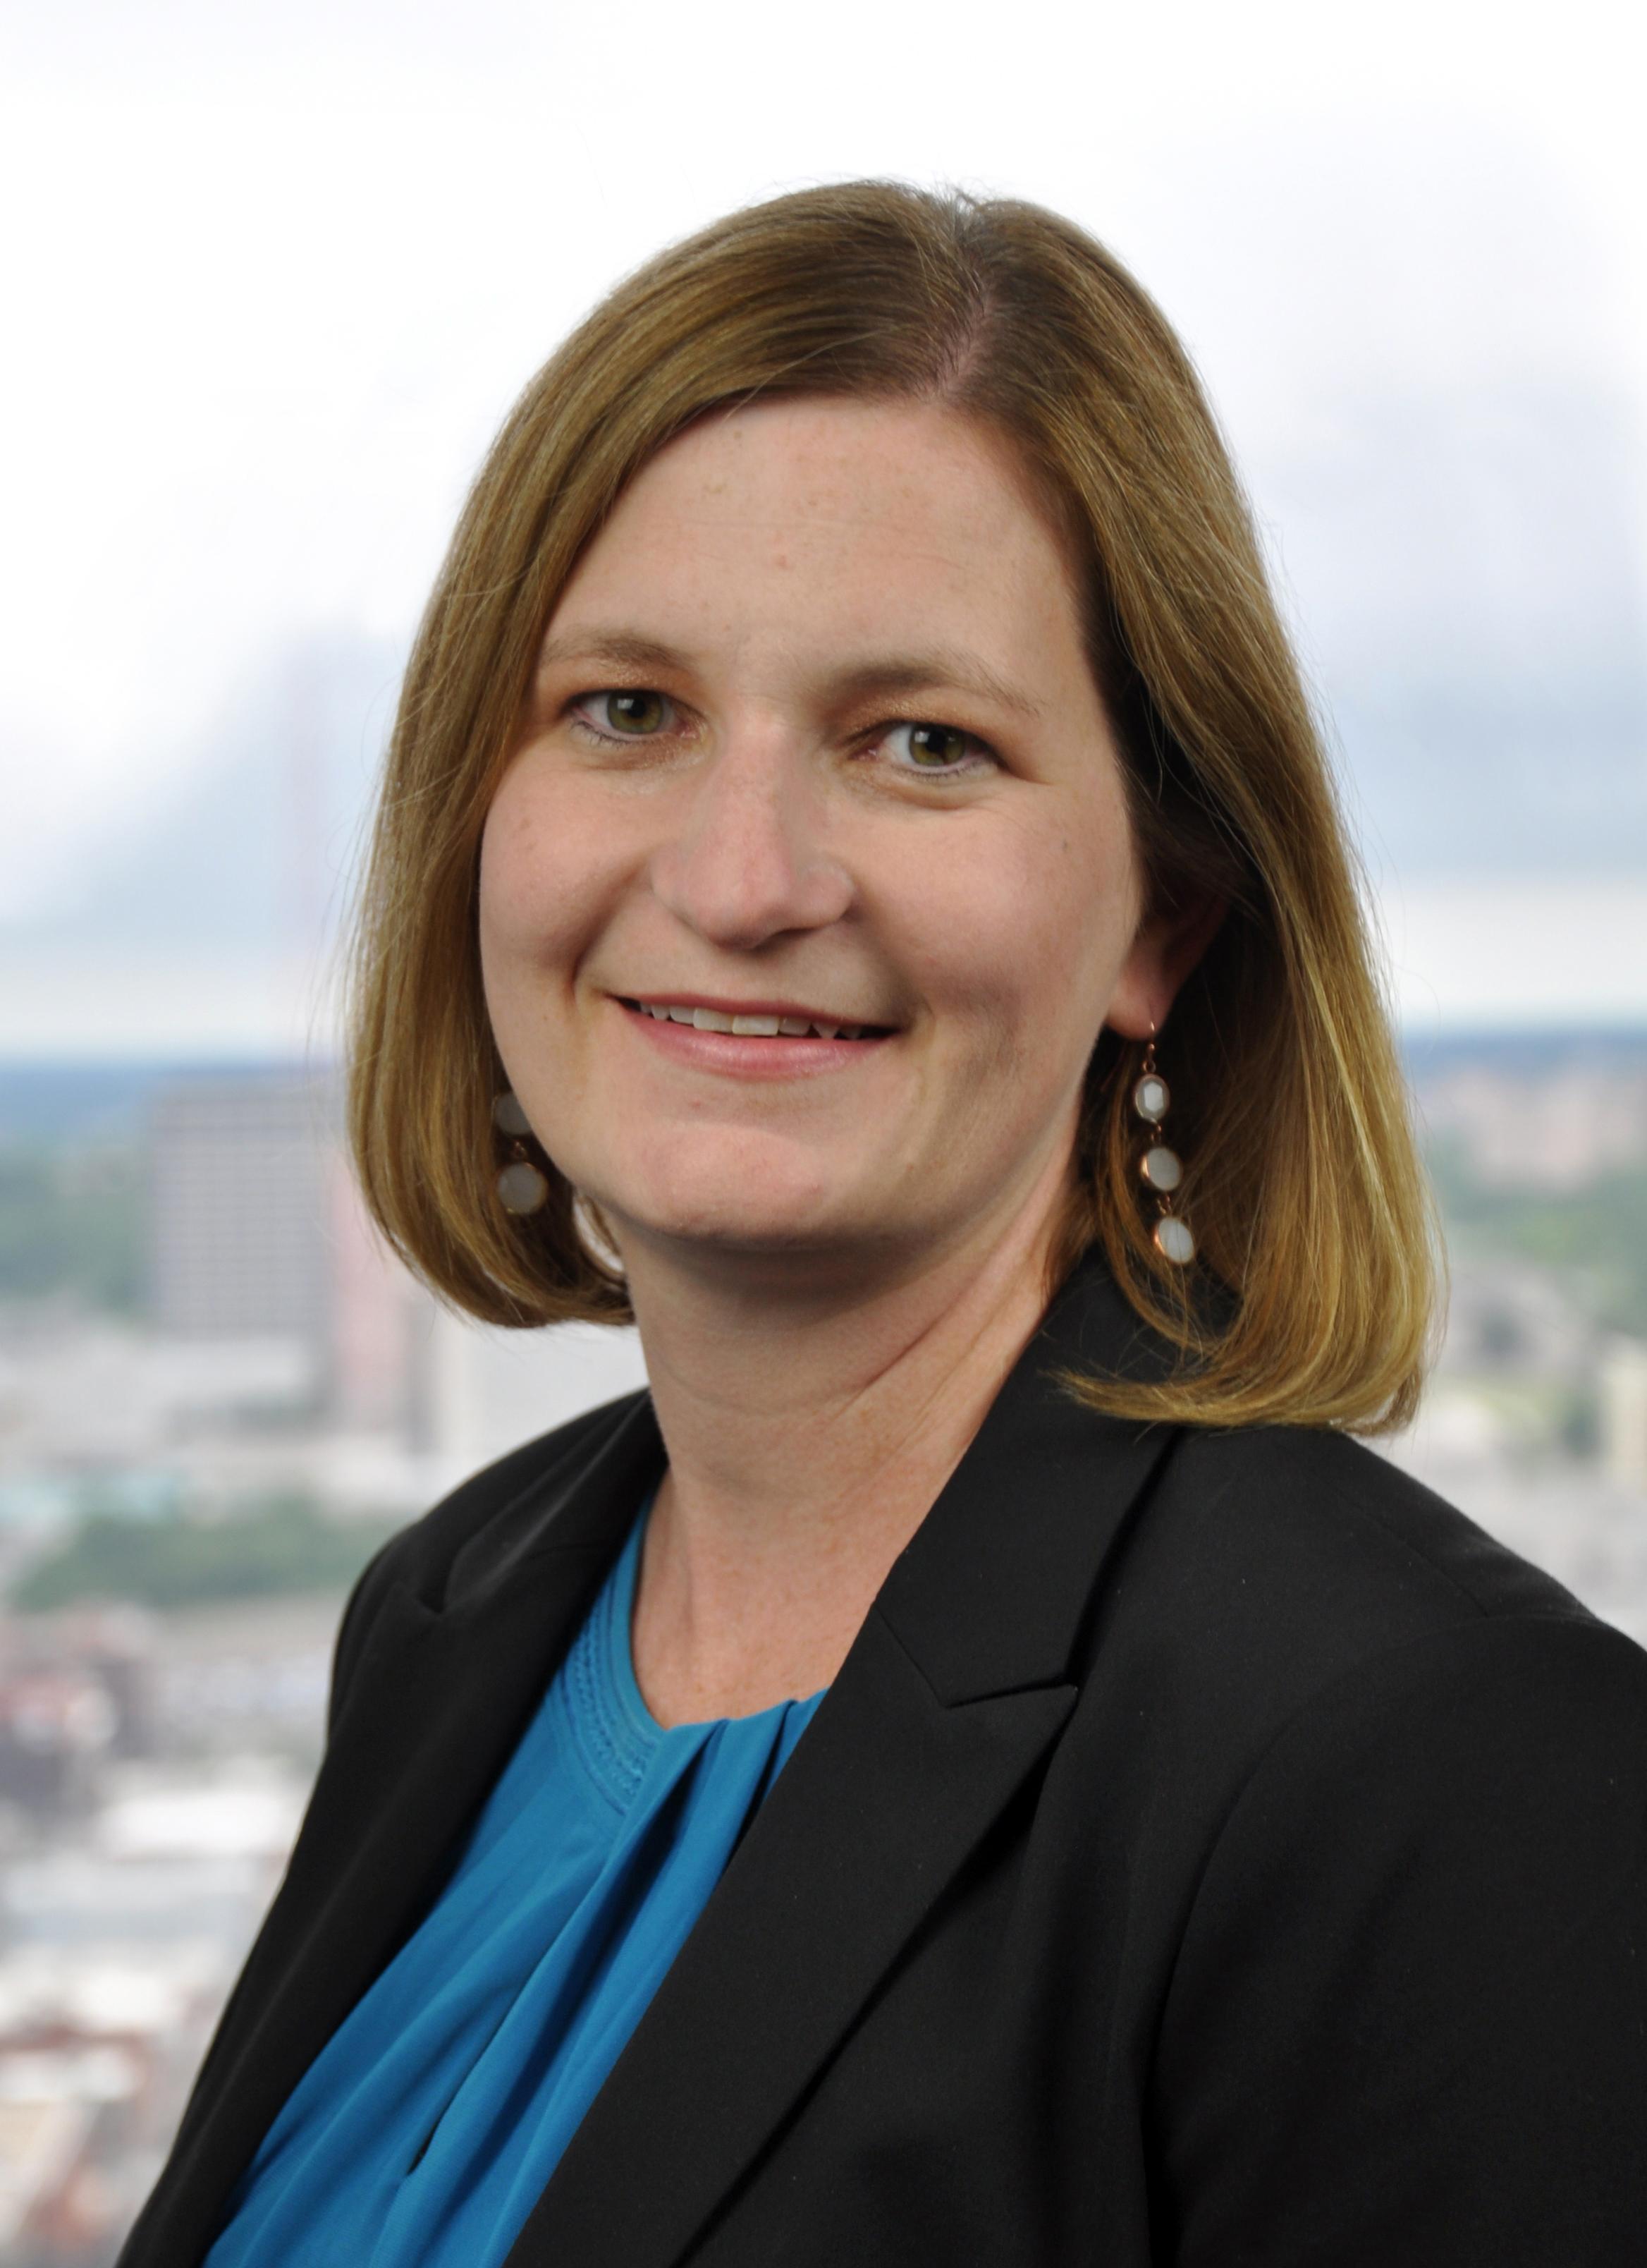 Nicole Van Denabeele Profile Image